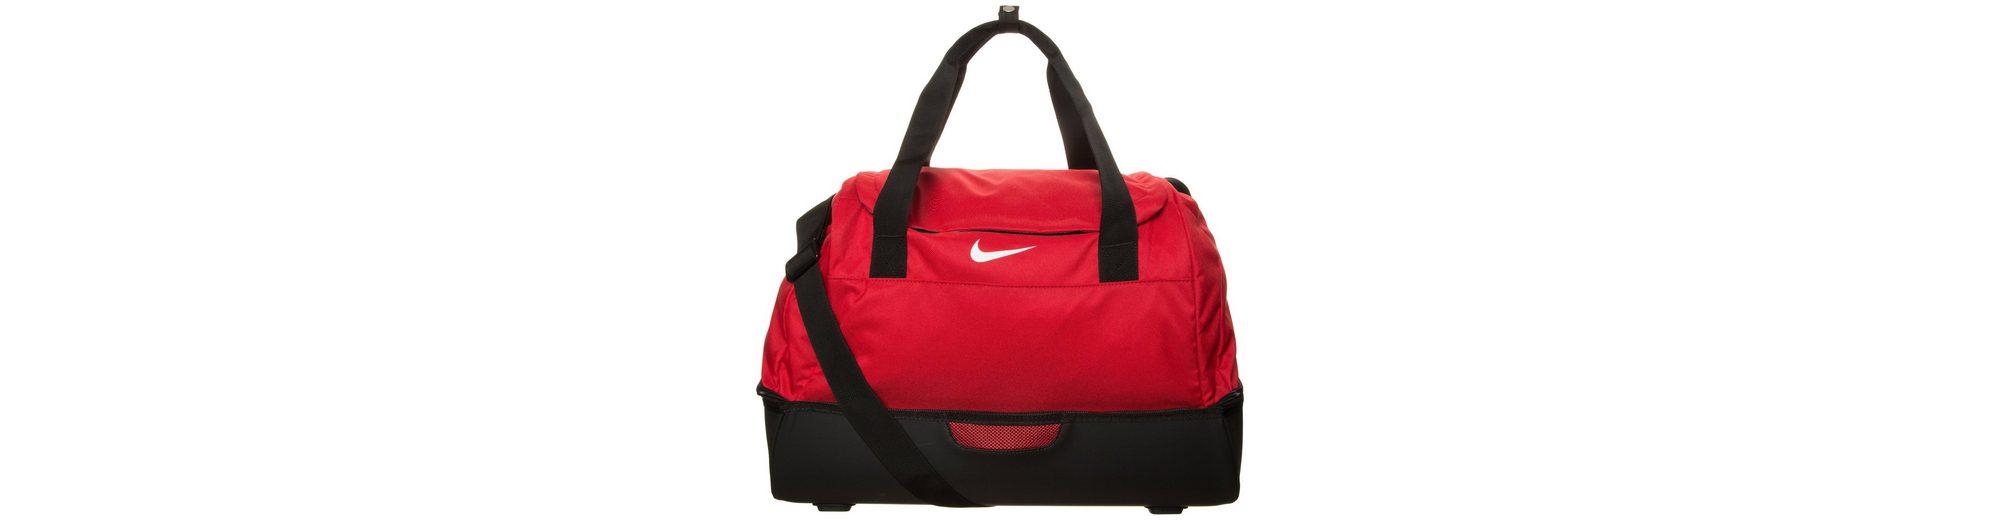 NIKE Club Team Swoosh Hardcase Sporttasche Medium